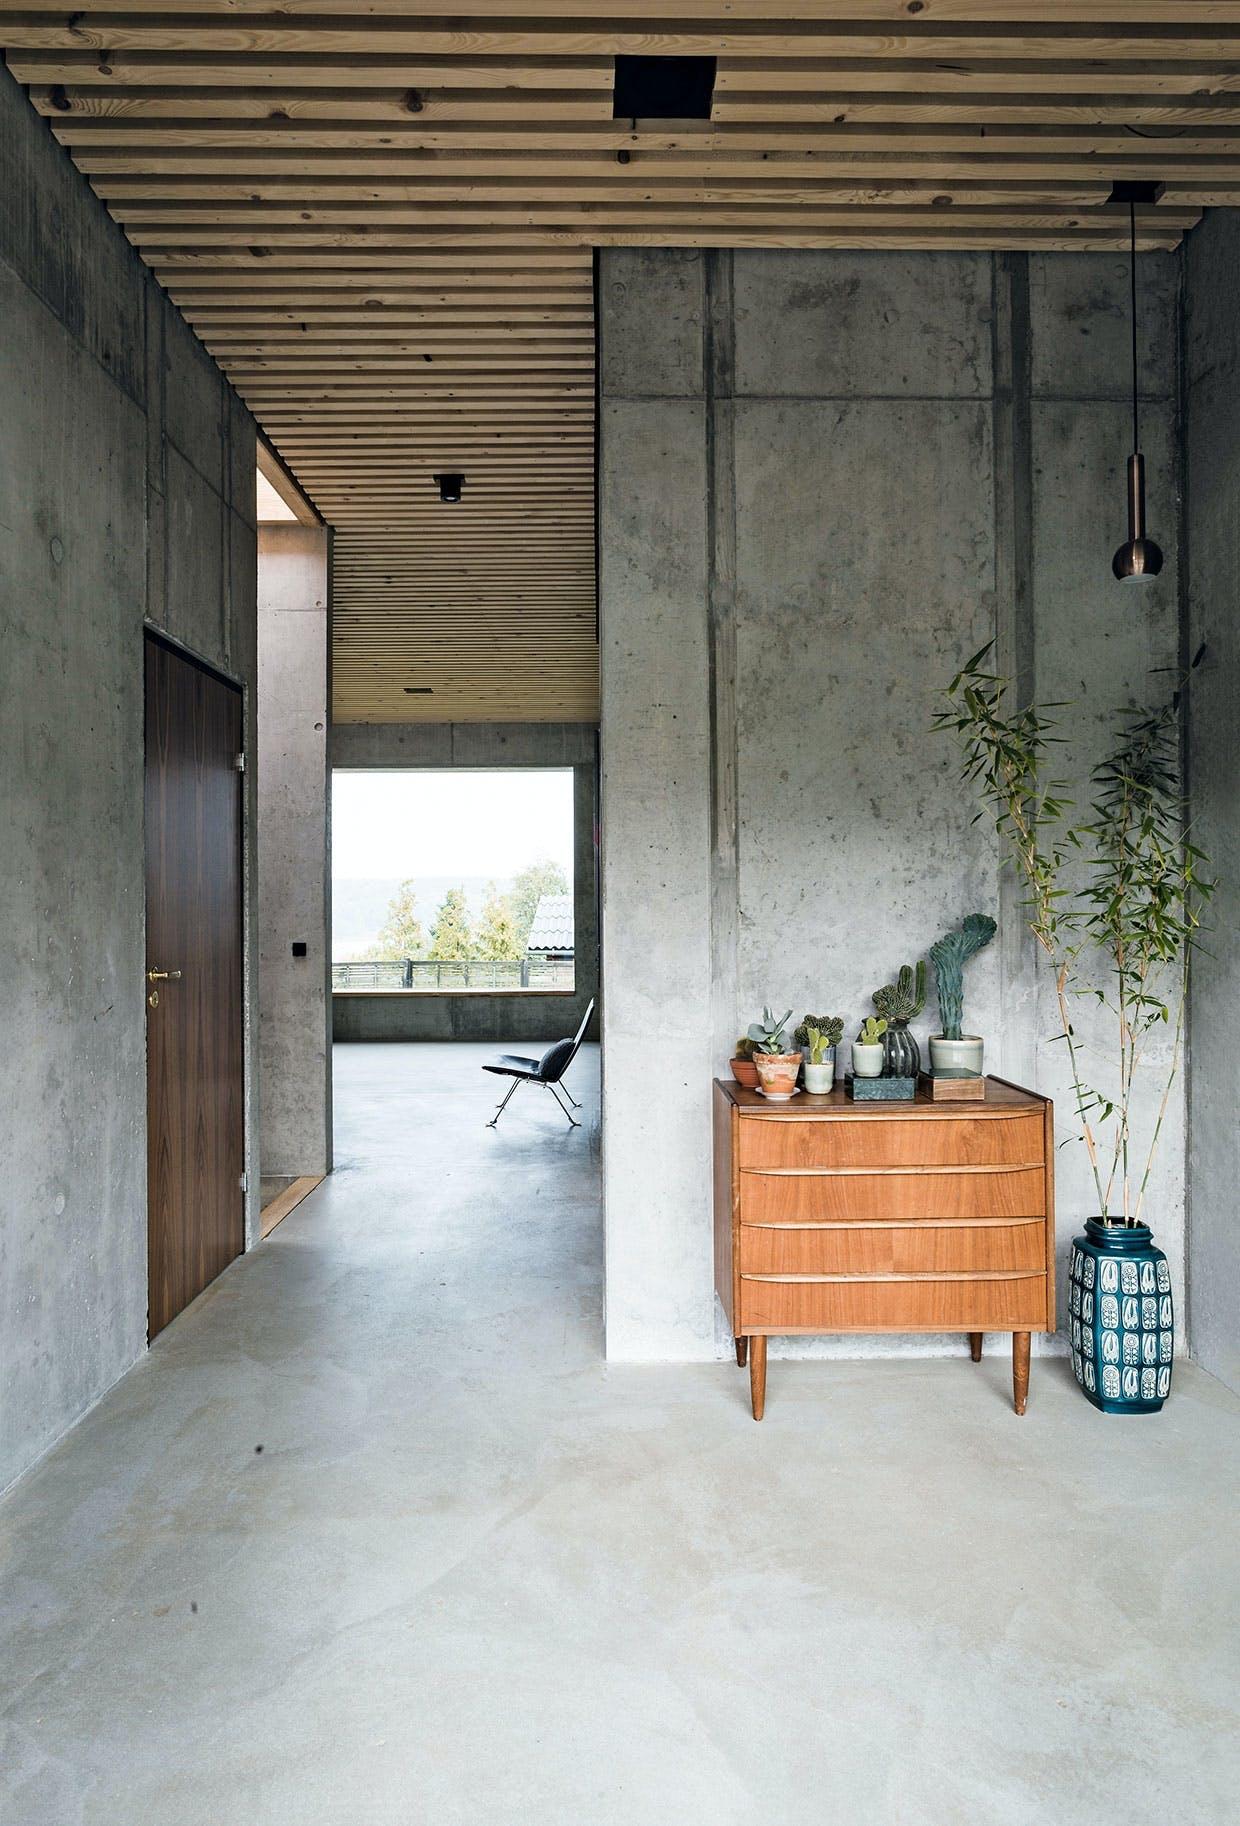 kommode antik beton træ planter entre